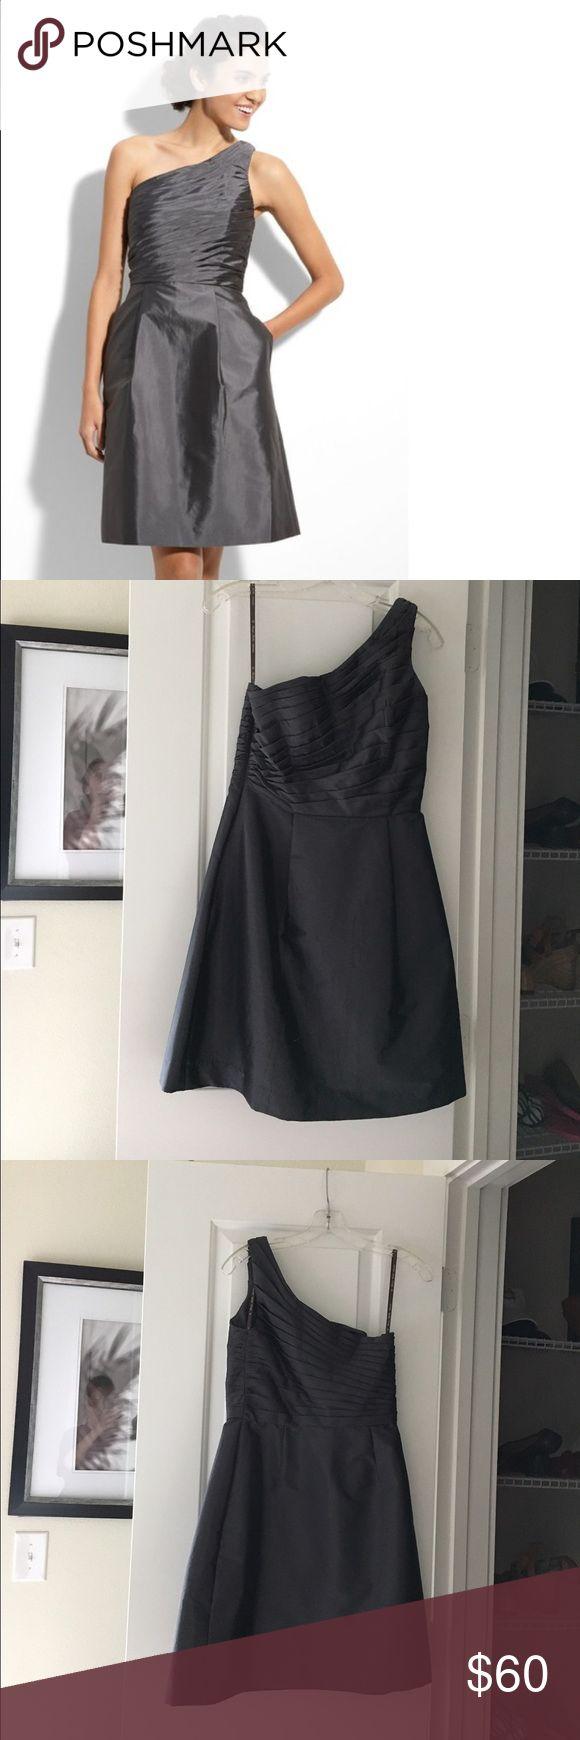 One shoulder A-line dress Monique lhullier dress worn only once! Great for weddings Monique Lhuillier Dresses One Shoulder